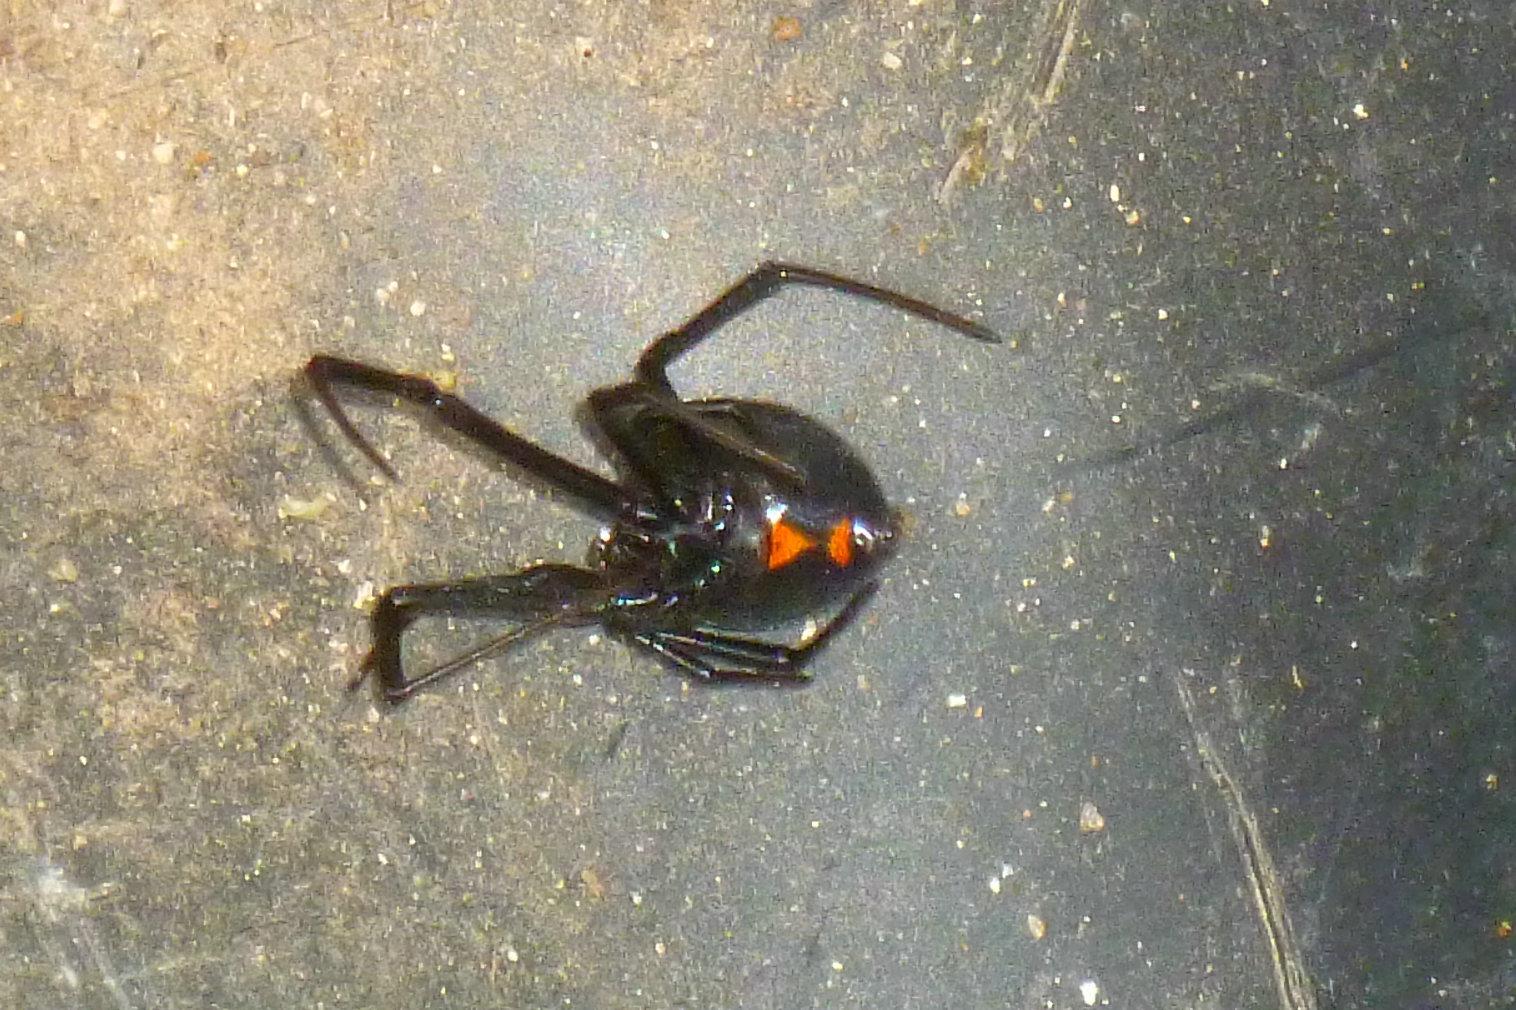 Pin Spider Identification Photos on Pinterest